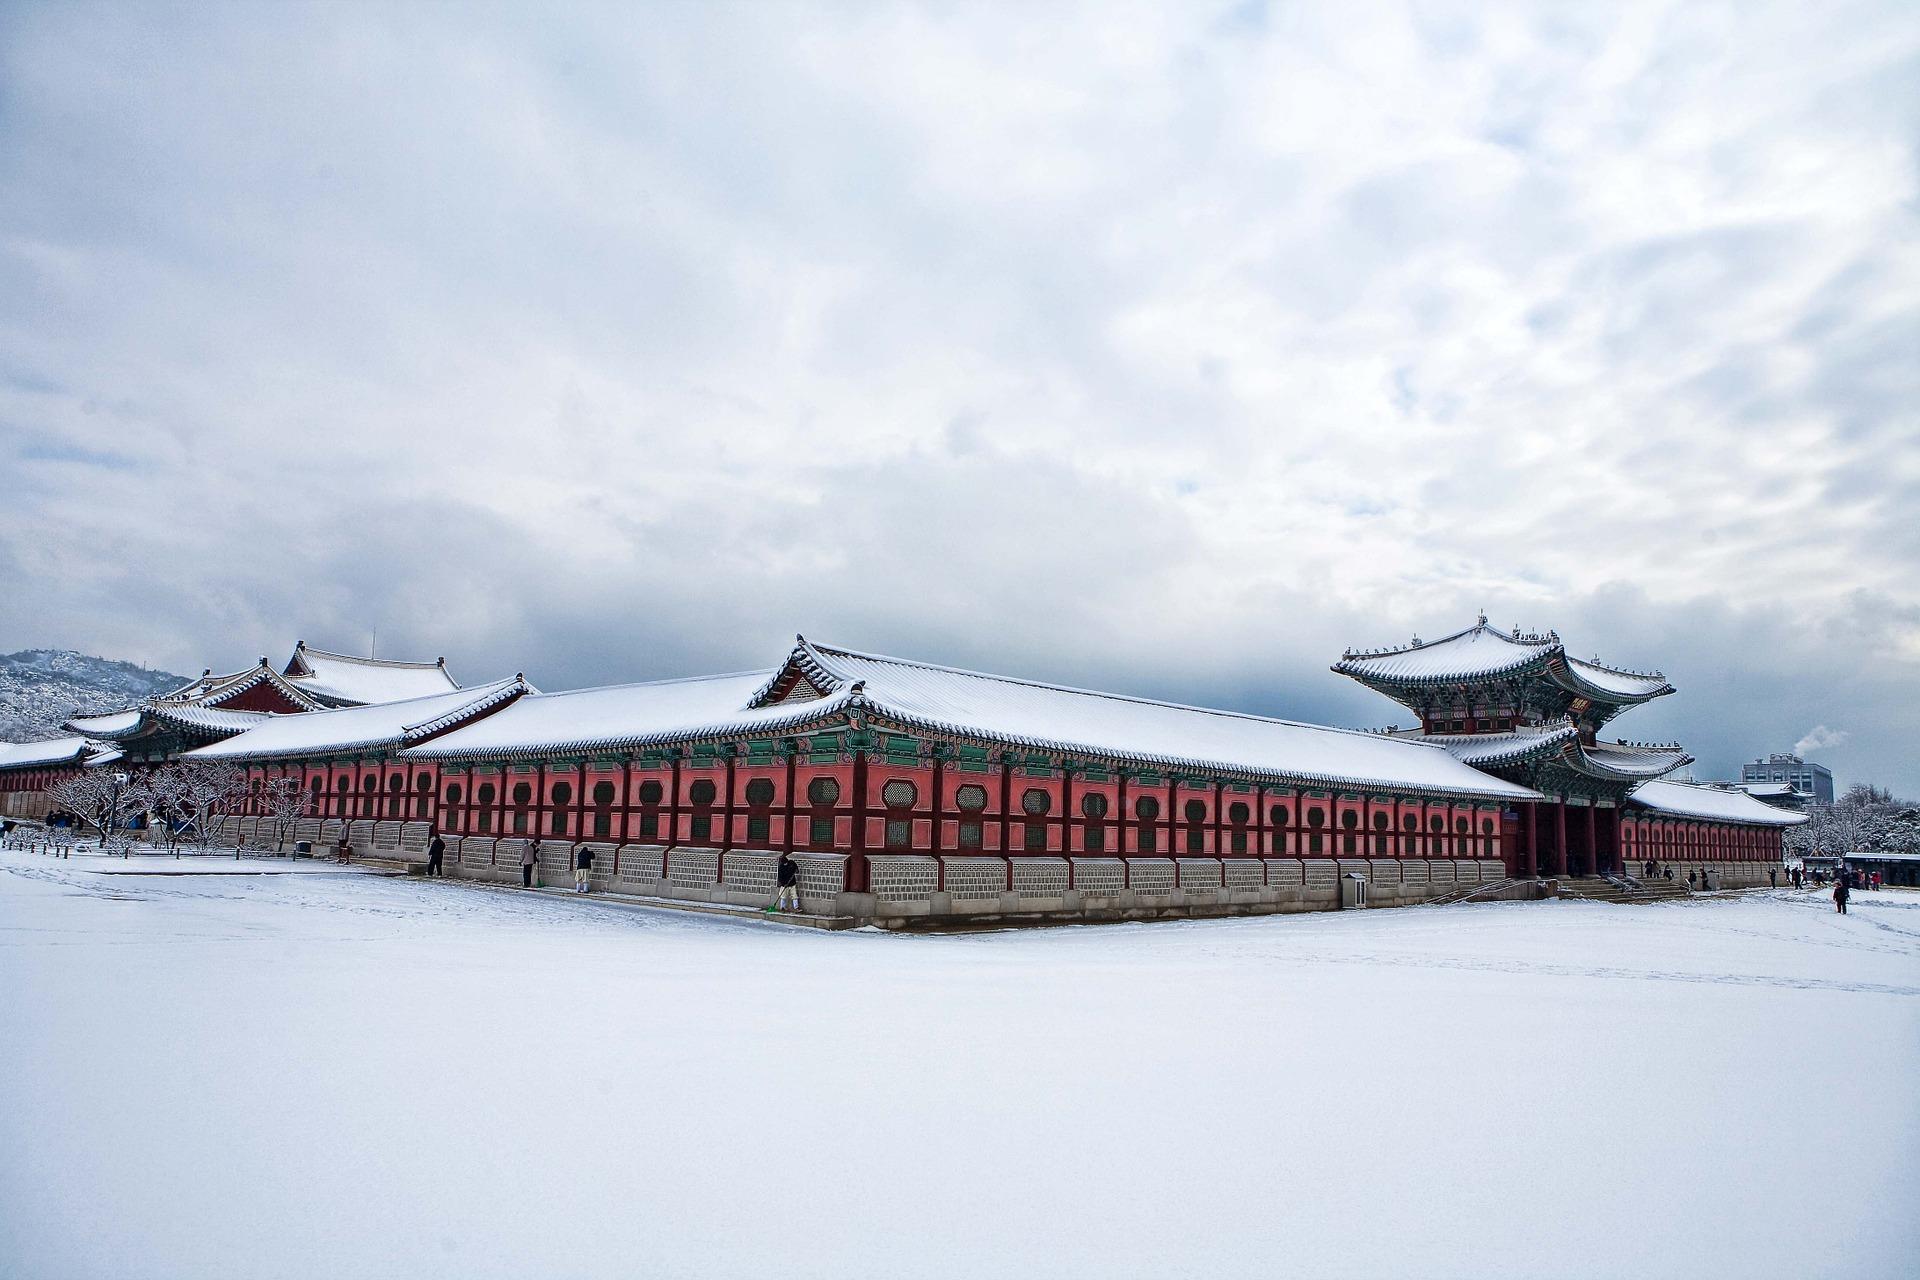 gyeongbok-palace-1214953_1920.jpg